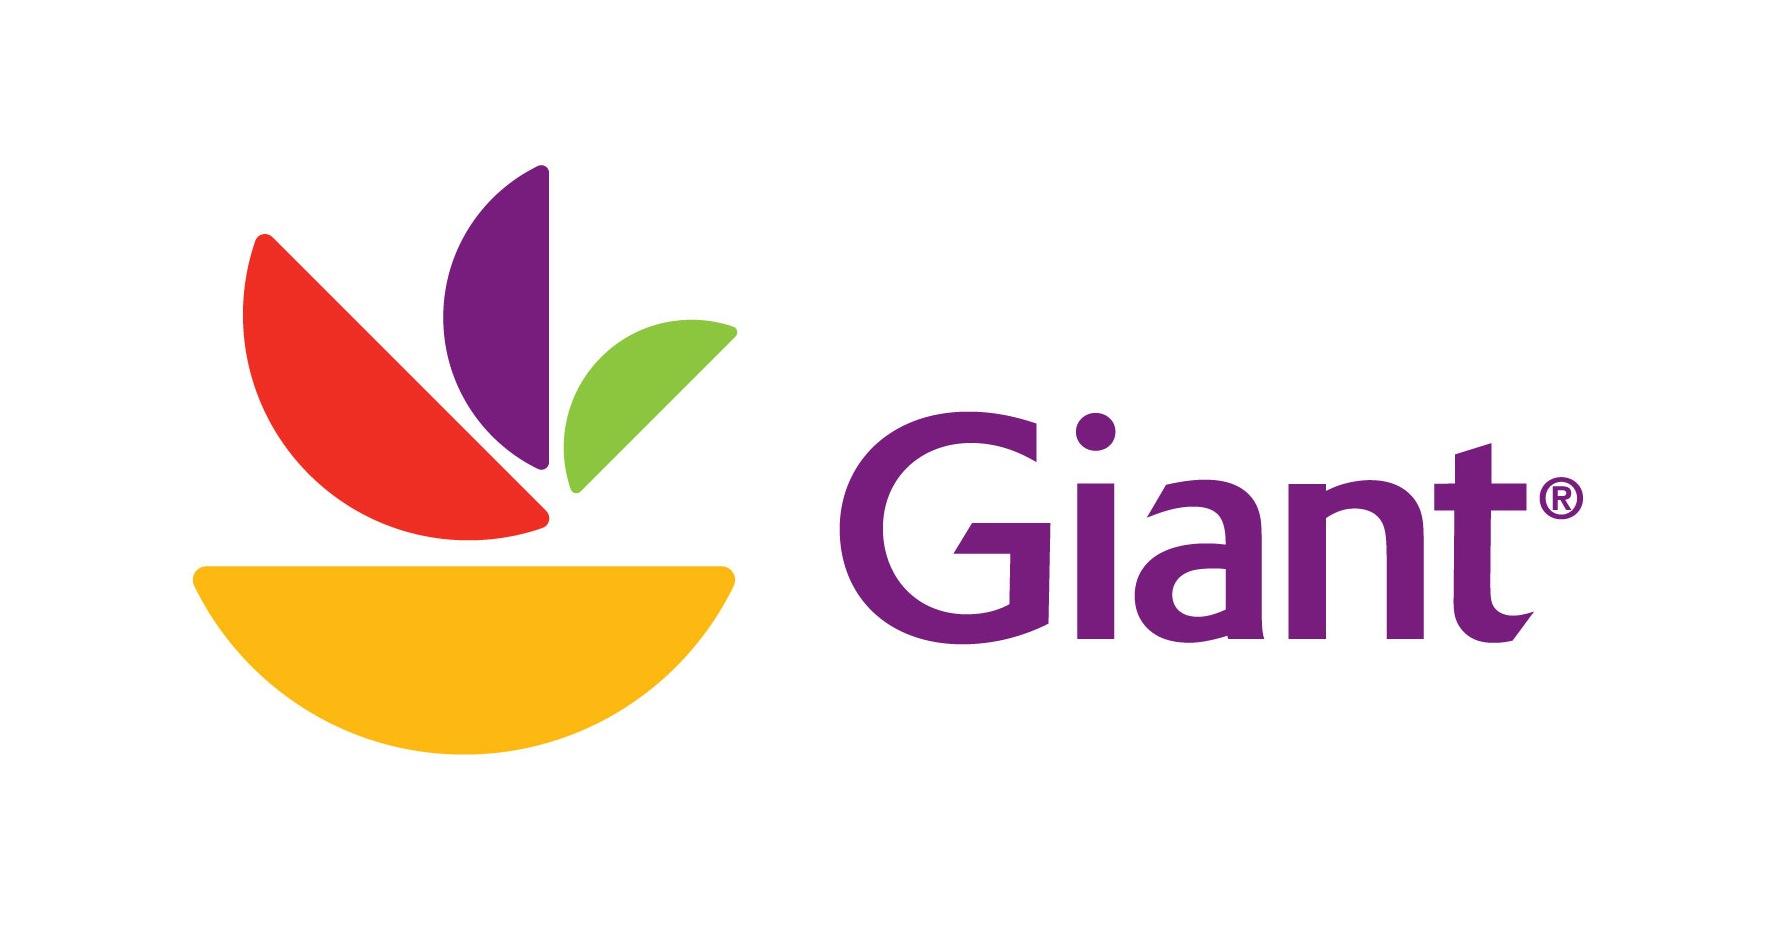 z_Copy_of_Giant_LogoH.jpg